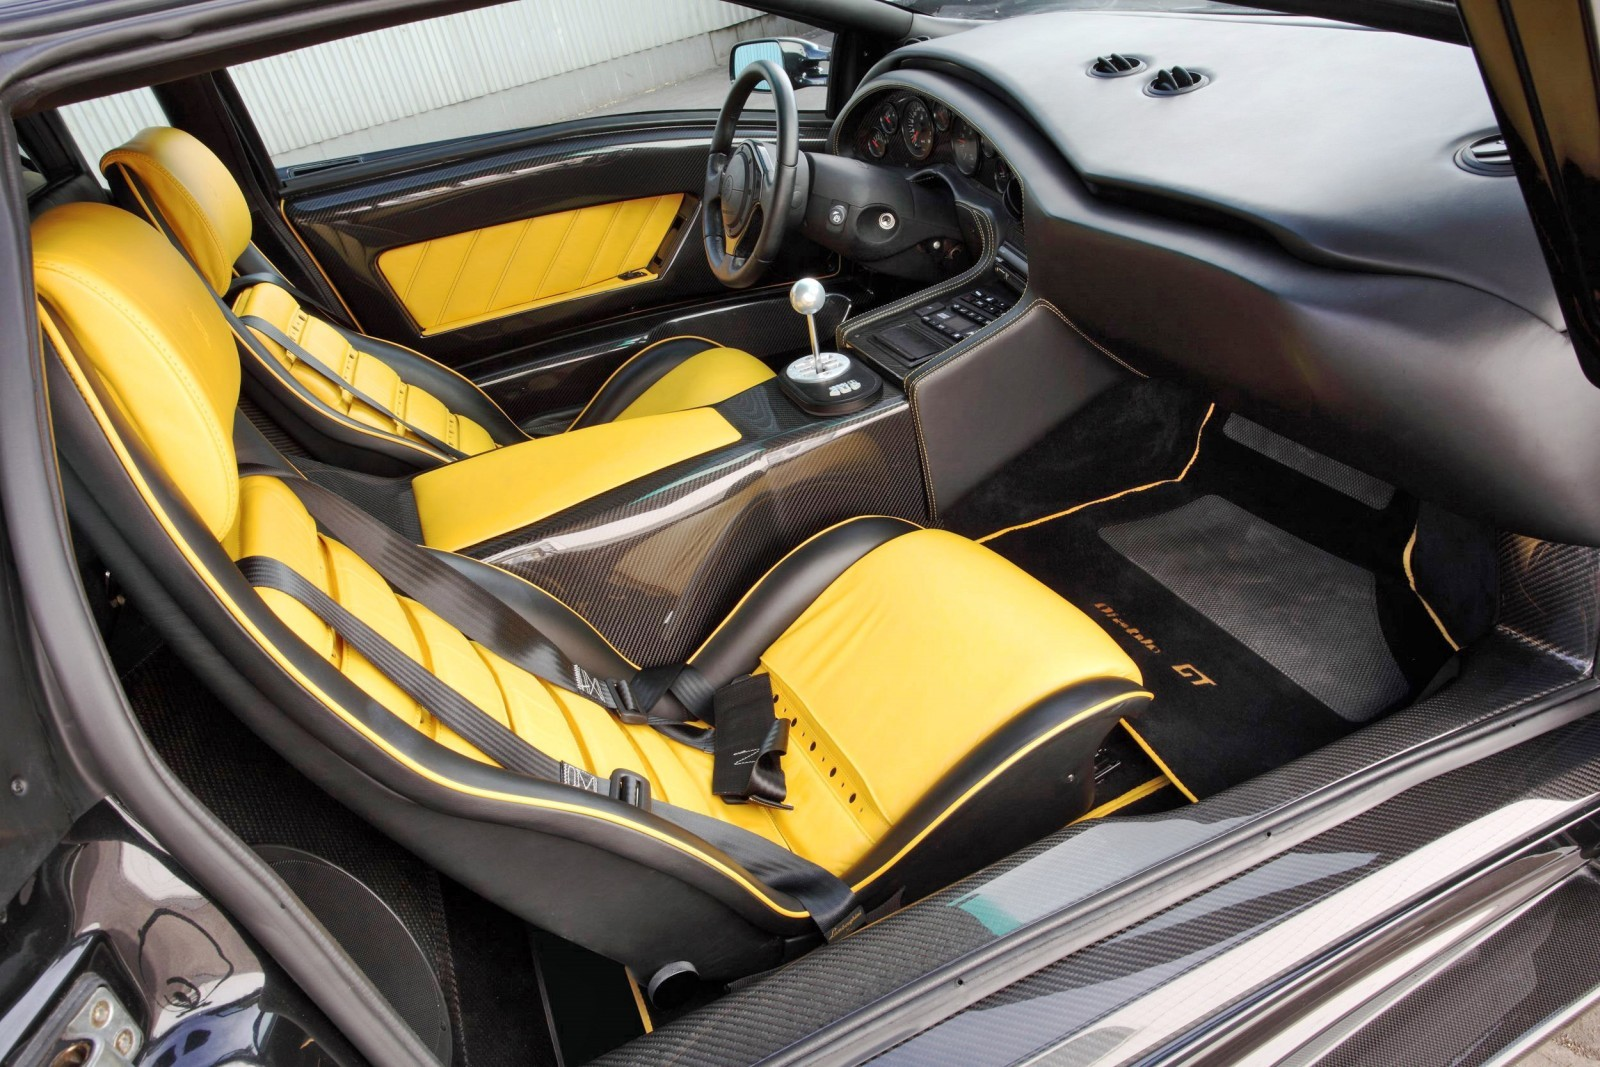 TOPCAR Classics 1999 Lamborghini Diablo GT 24